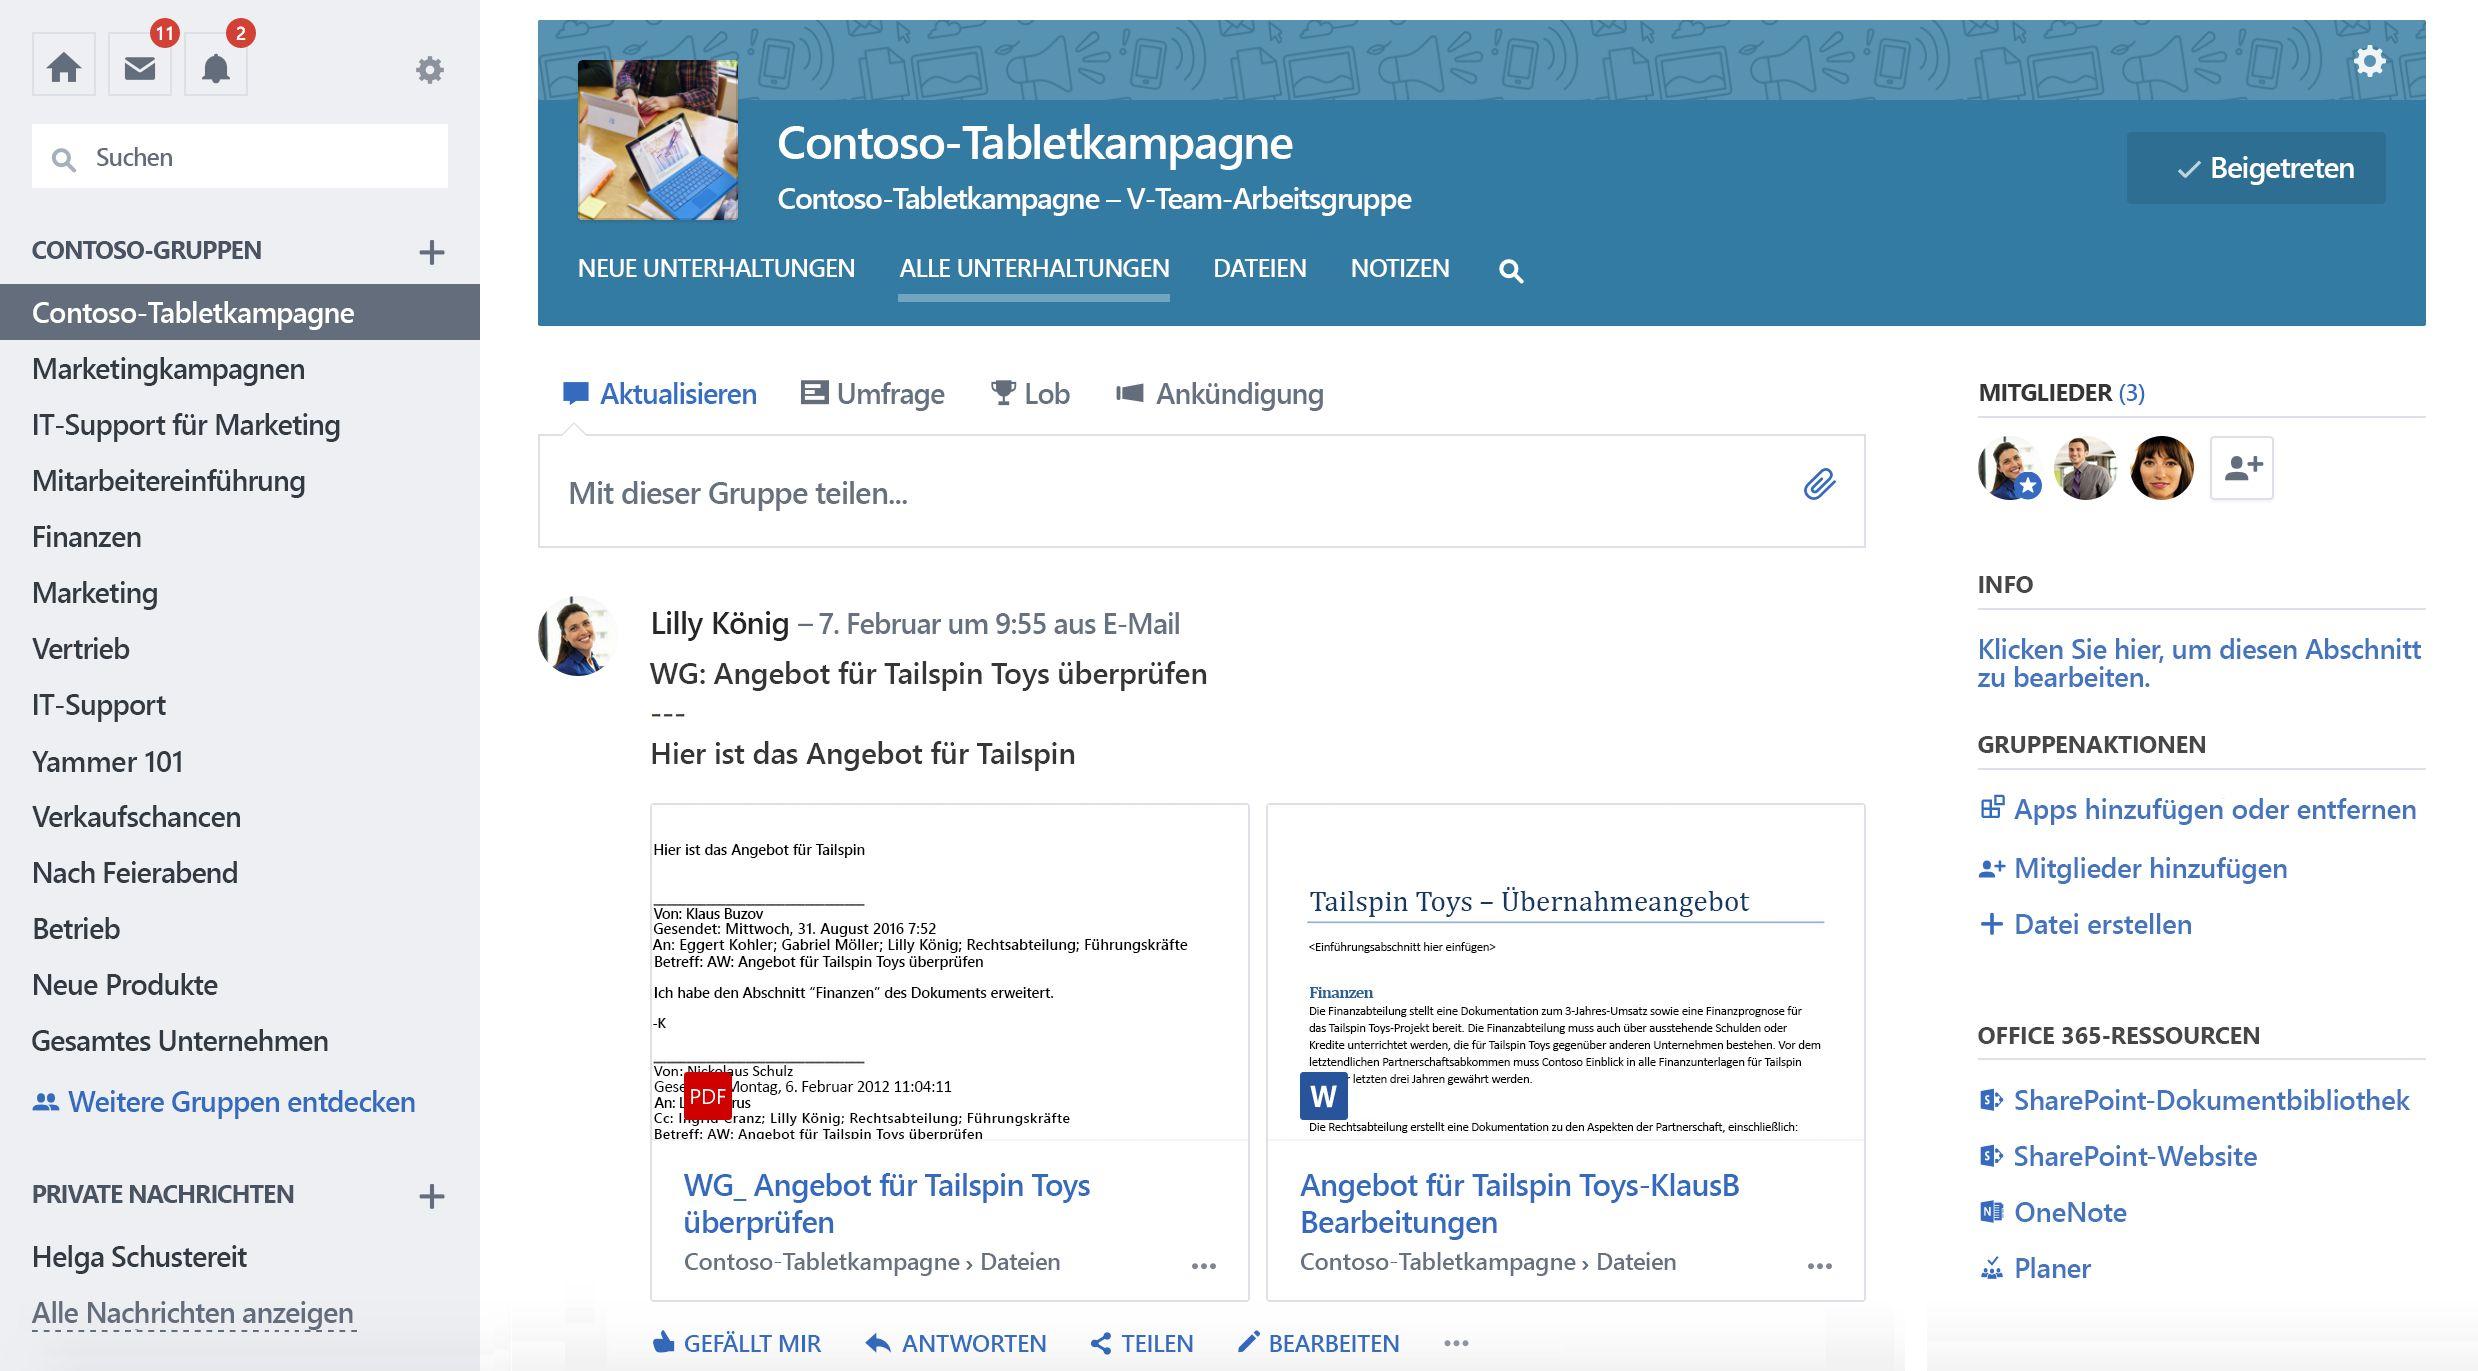 Screenshot der Office 365 verbunden Yammer Gruppe Unterhaltungen